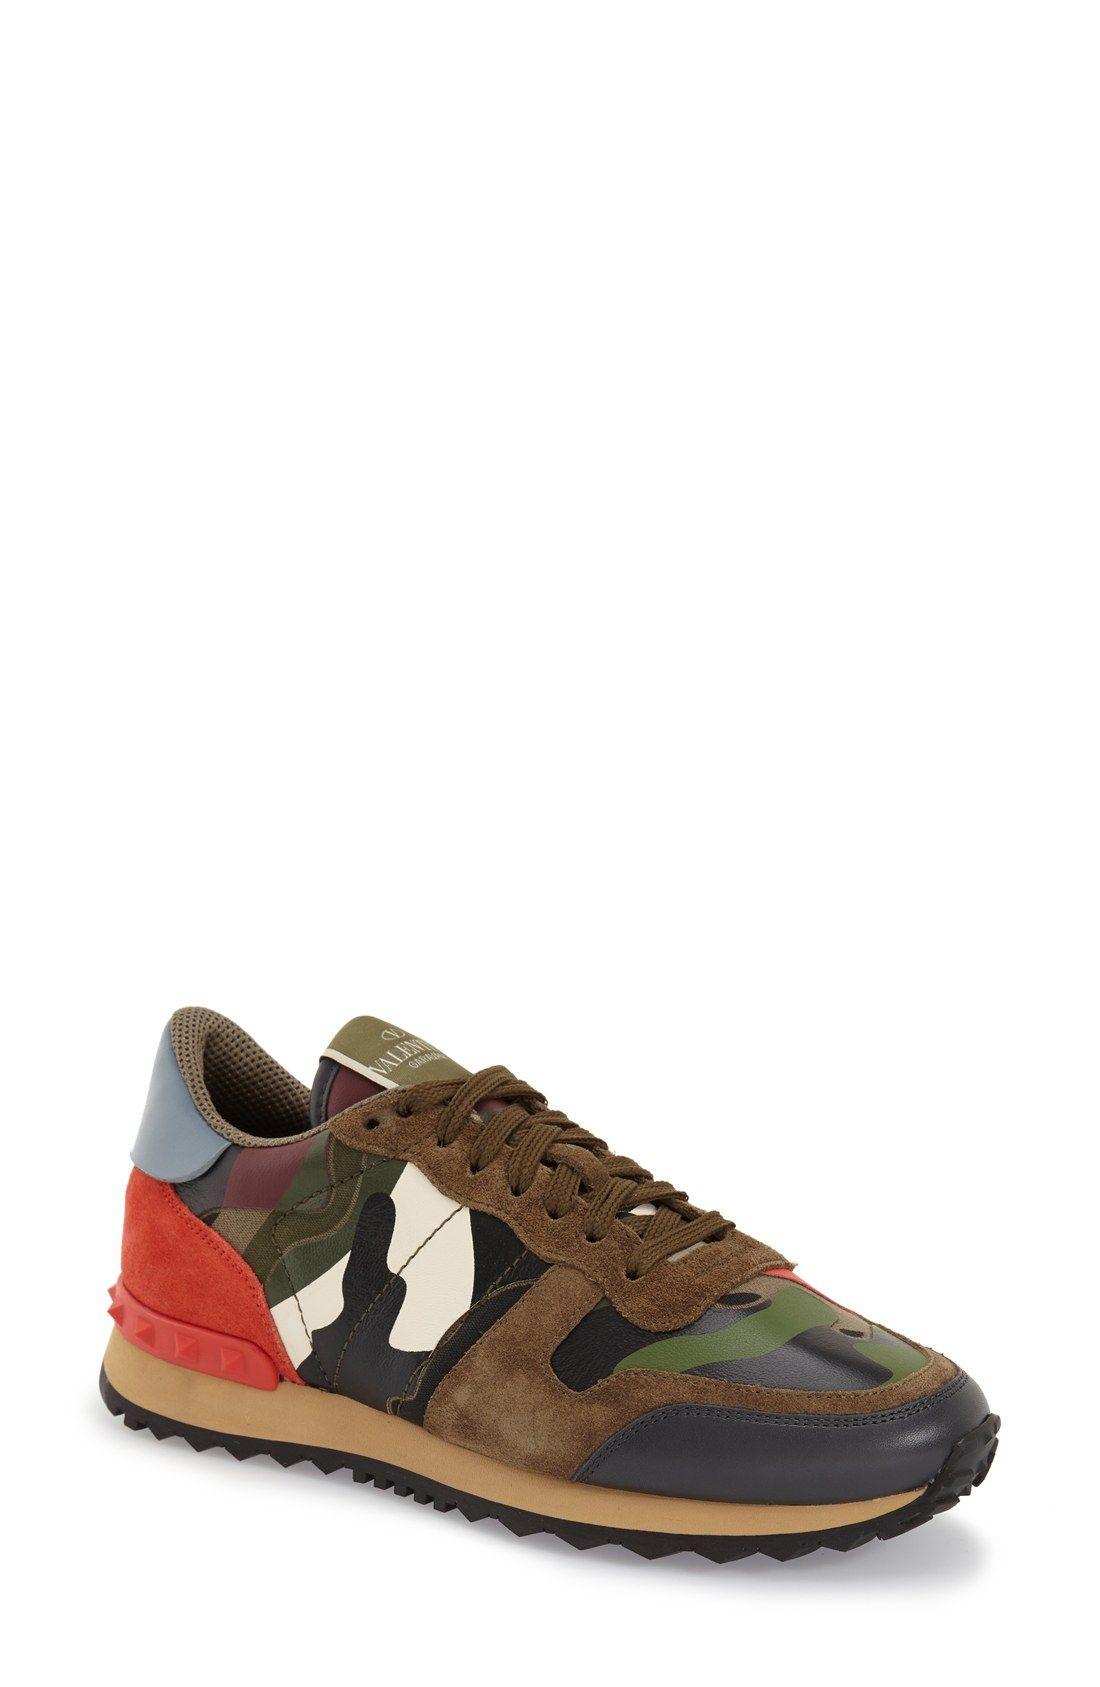 45749eab1d85 Valentino Rockstud Camo Sneaker (Women)   Nordstrom Valentino Camo  Sneakers, Valentino Shoes,